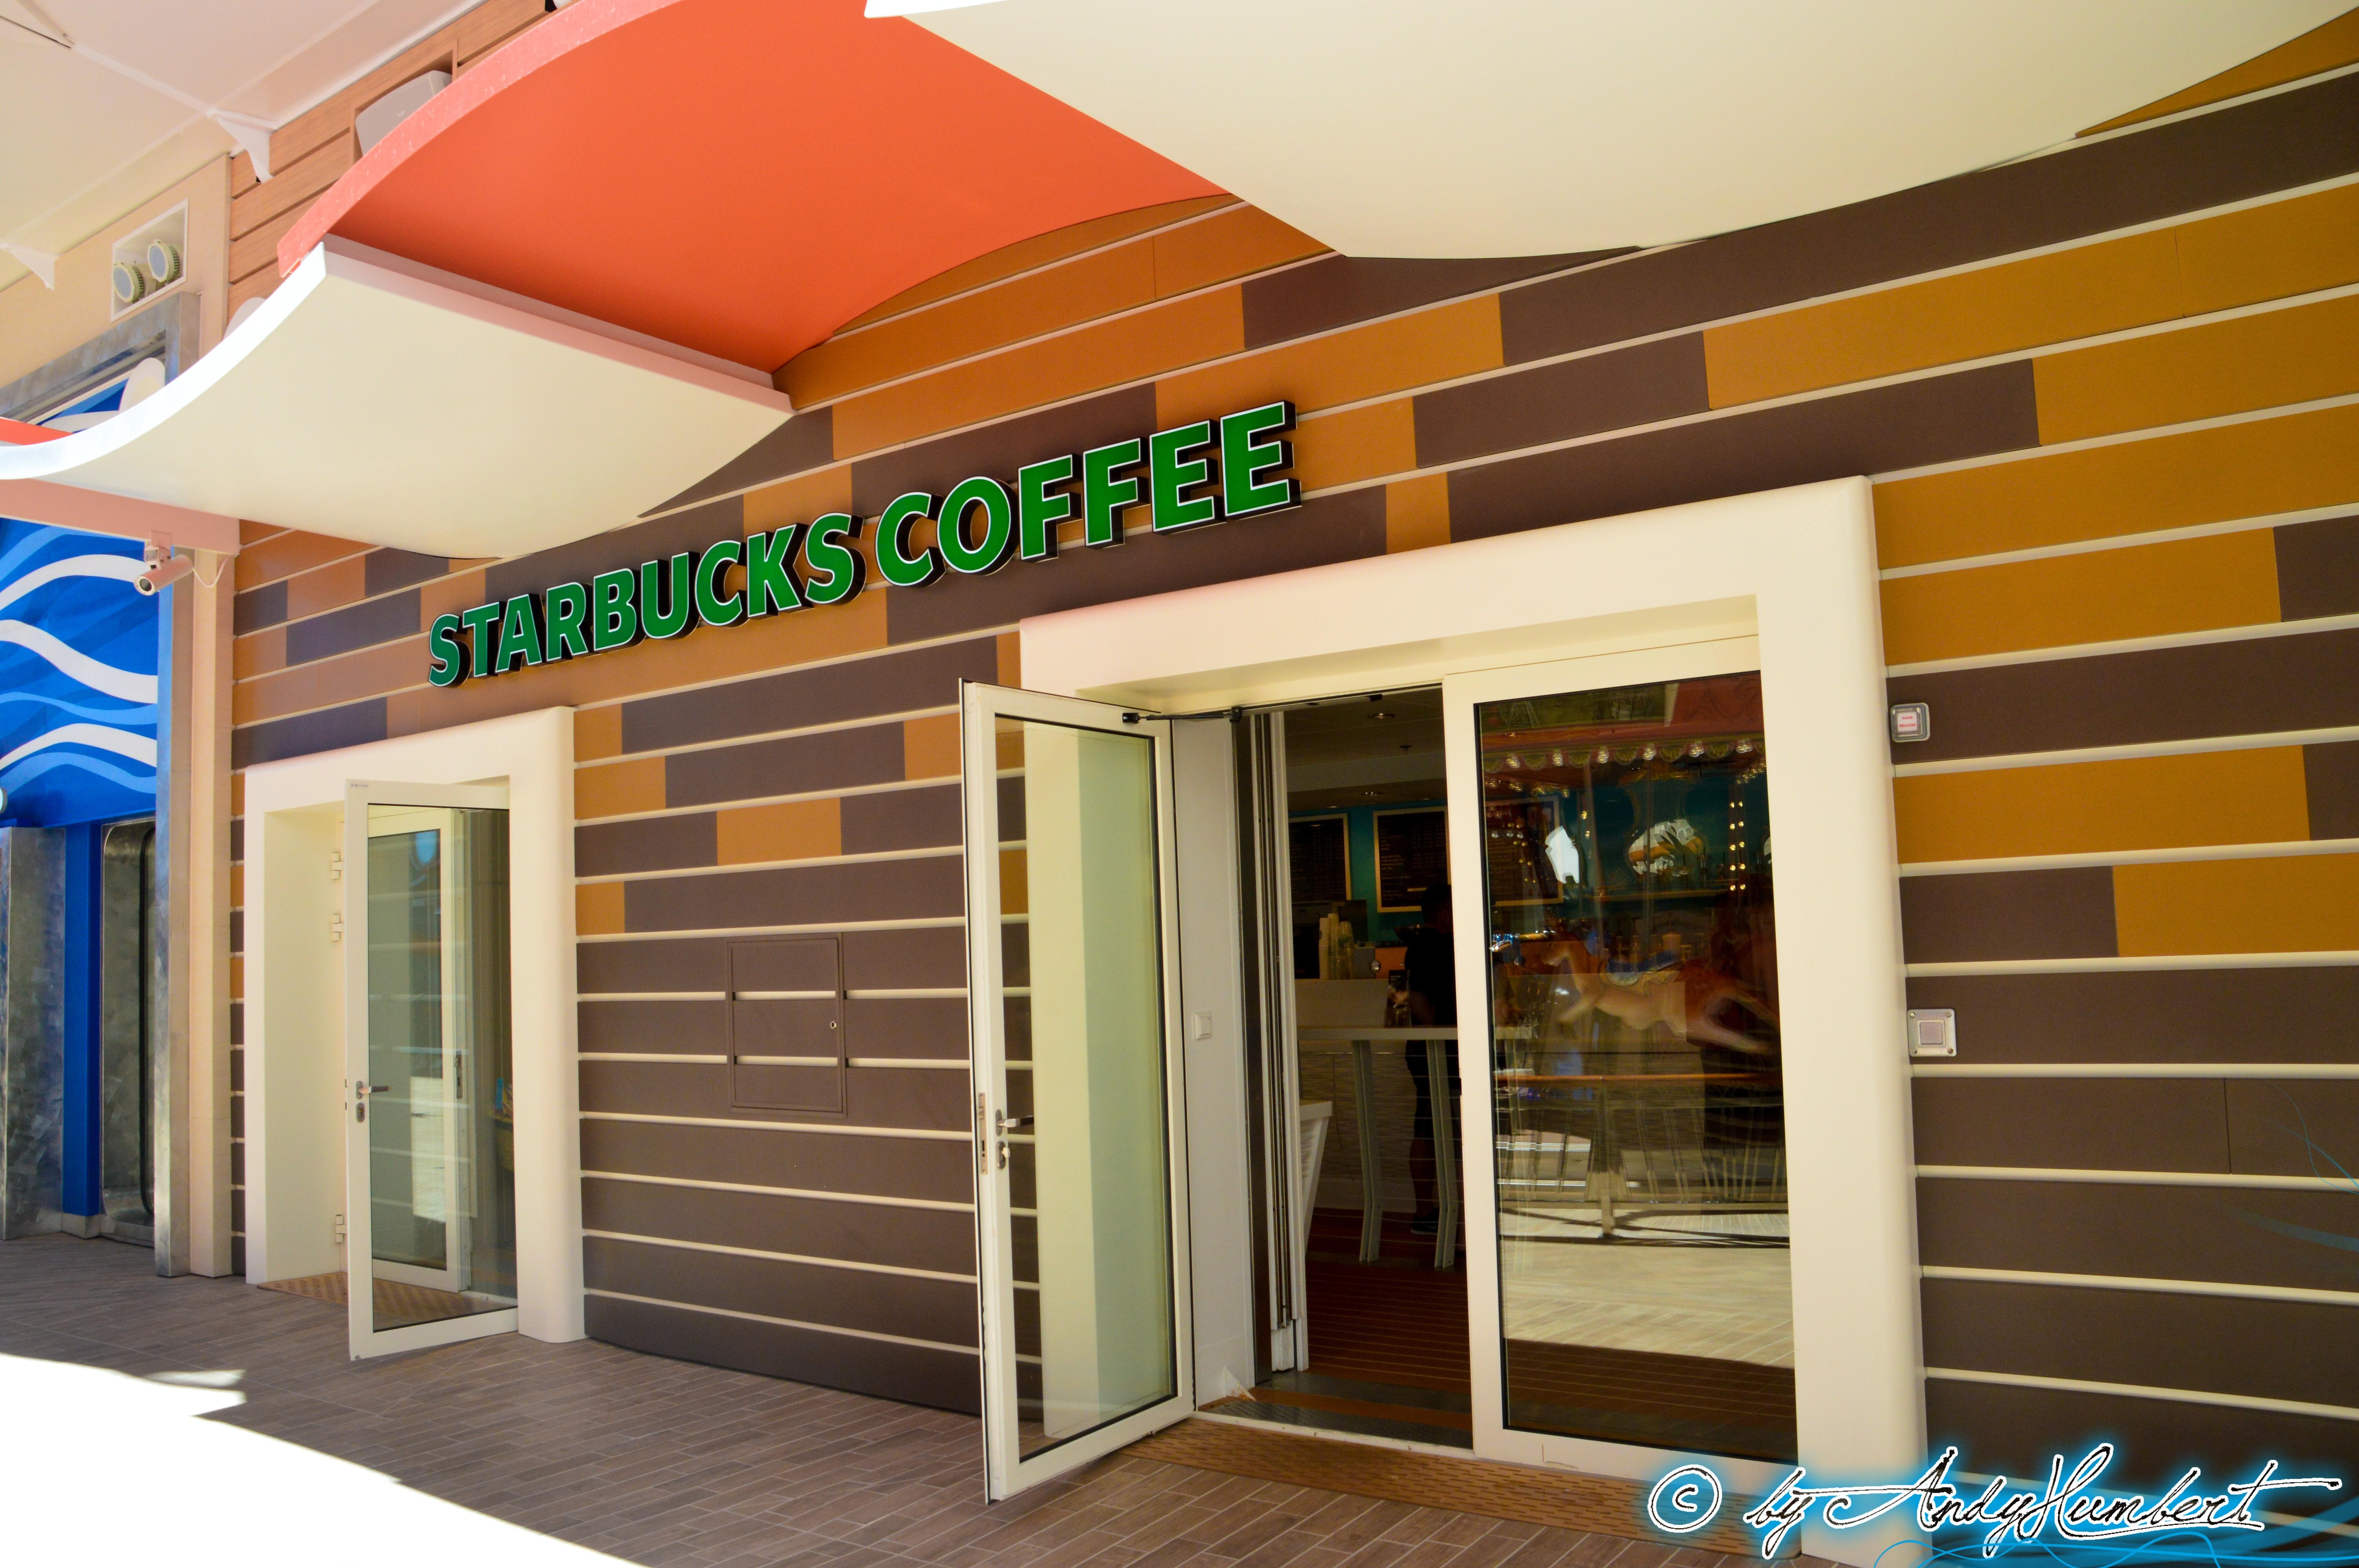 Starbucks Coffe (pont 6)